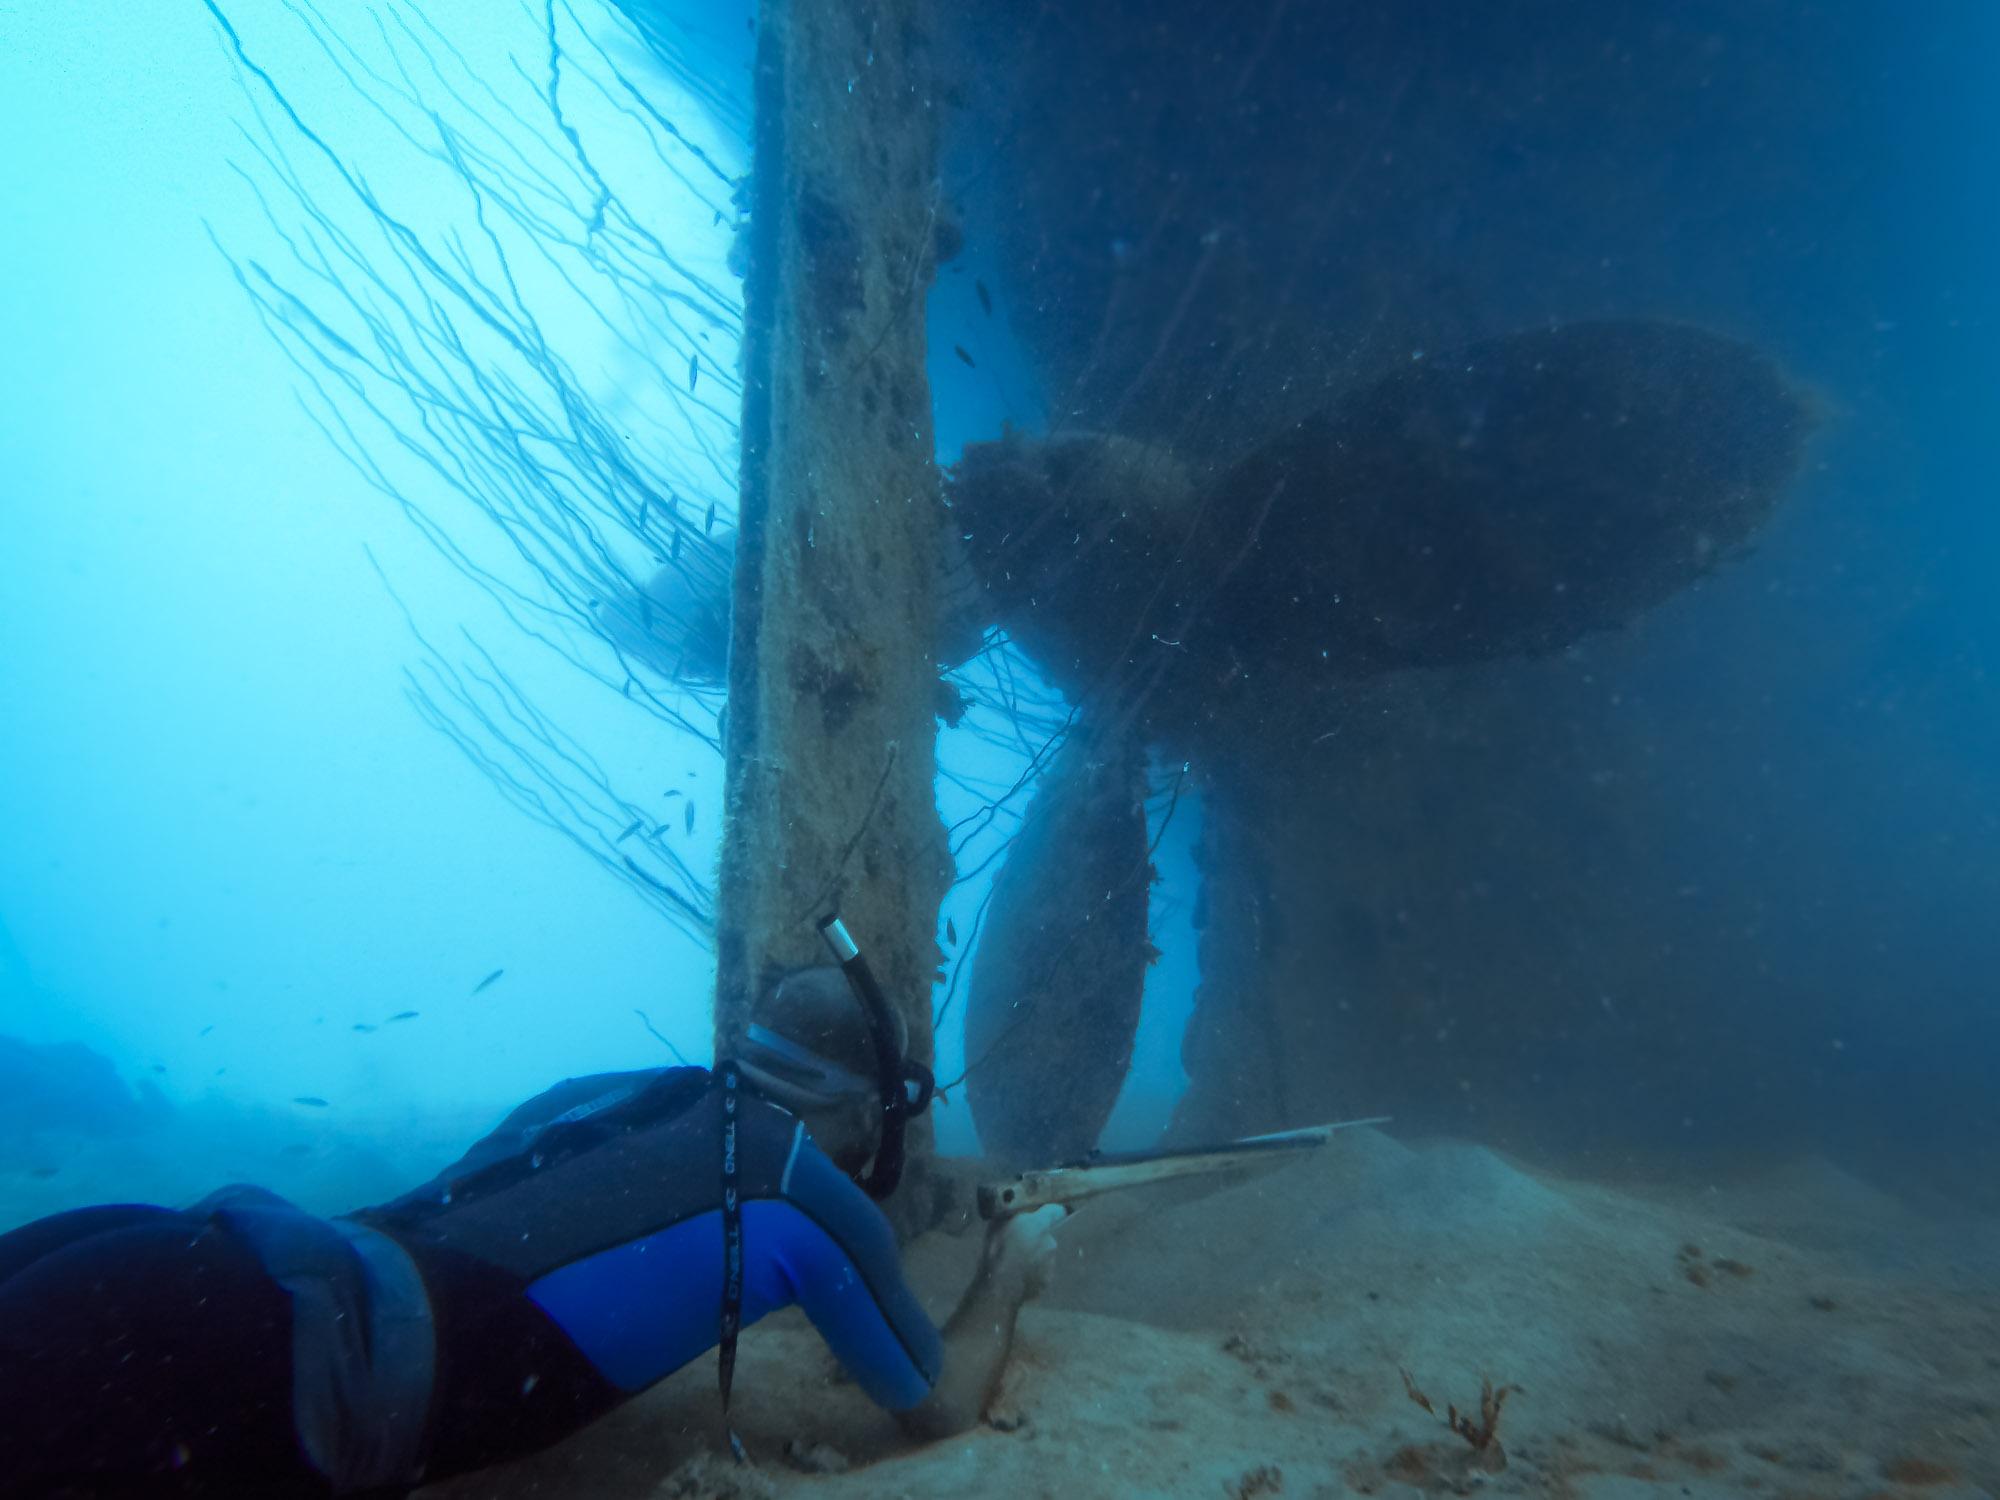 Spearfishing alongside the rudder and massive propeller of the Terushima Maru